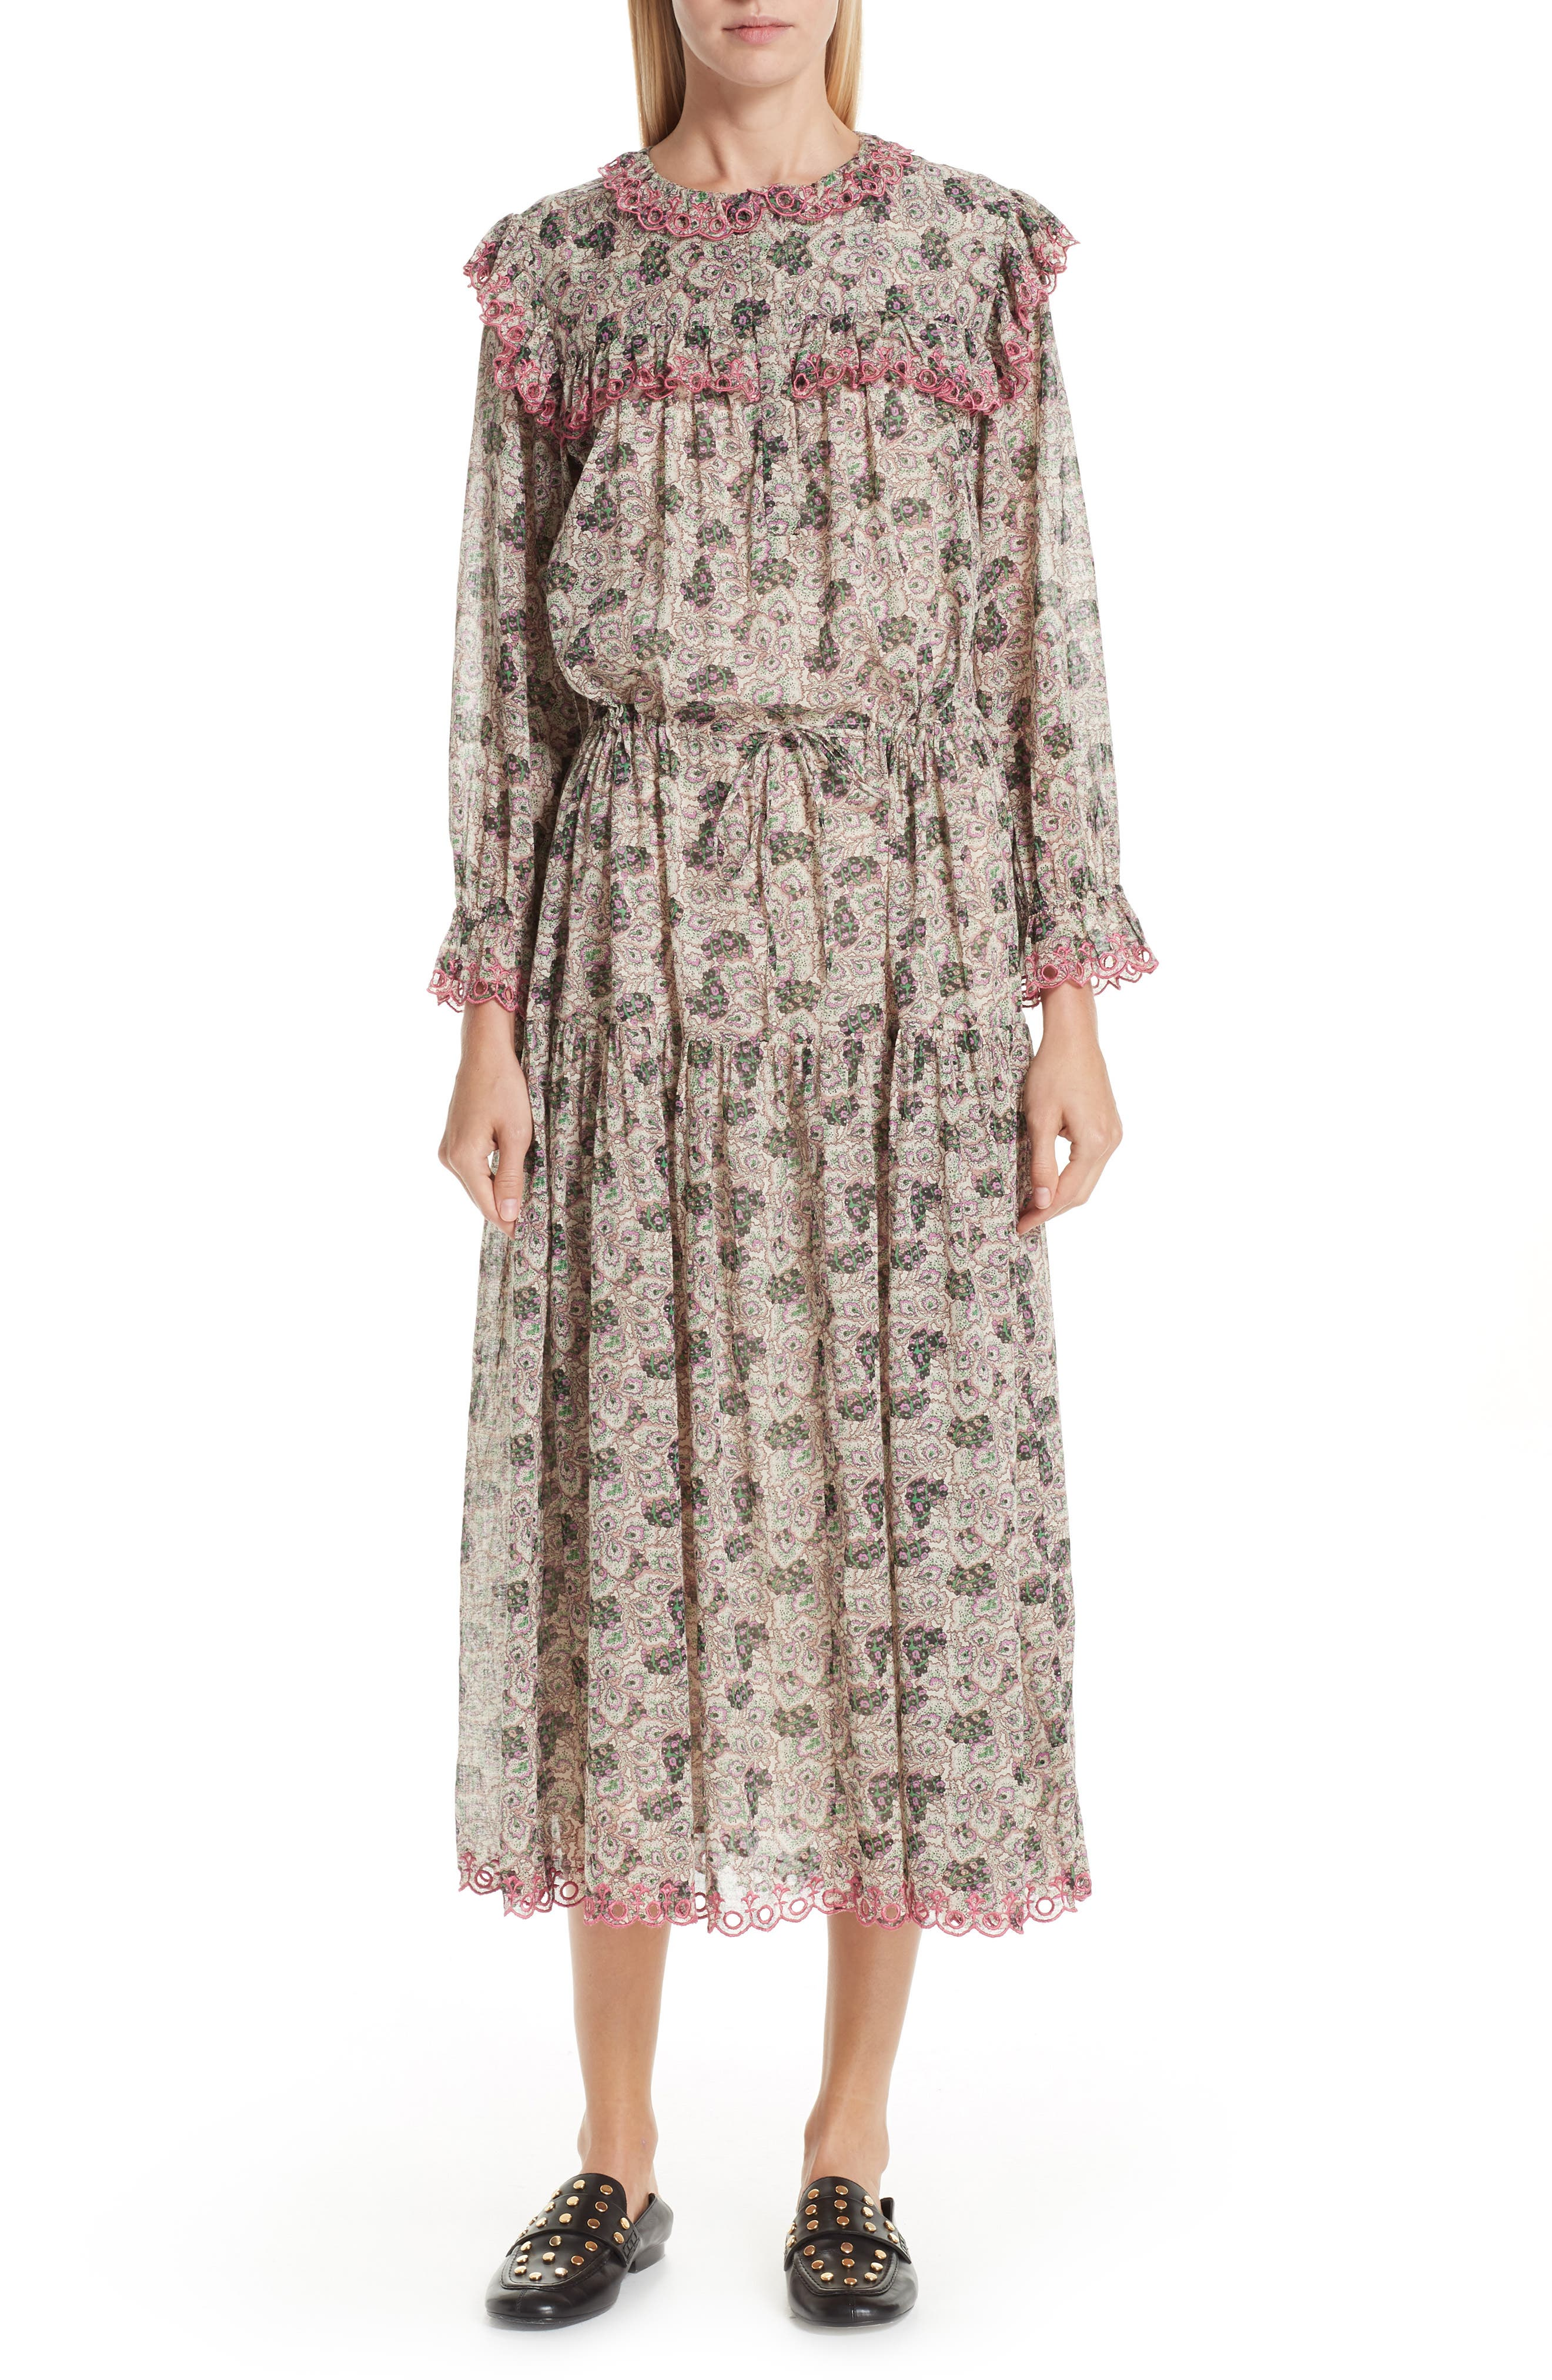 70s Dresses – Disco Dresses, Hippie Dresses, Wrap Dresses Womens Isabel Marant Etoile Eina Floral Print Midi Dress $229.98 AT vintagedancer.com